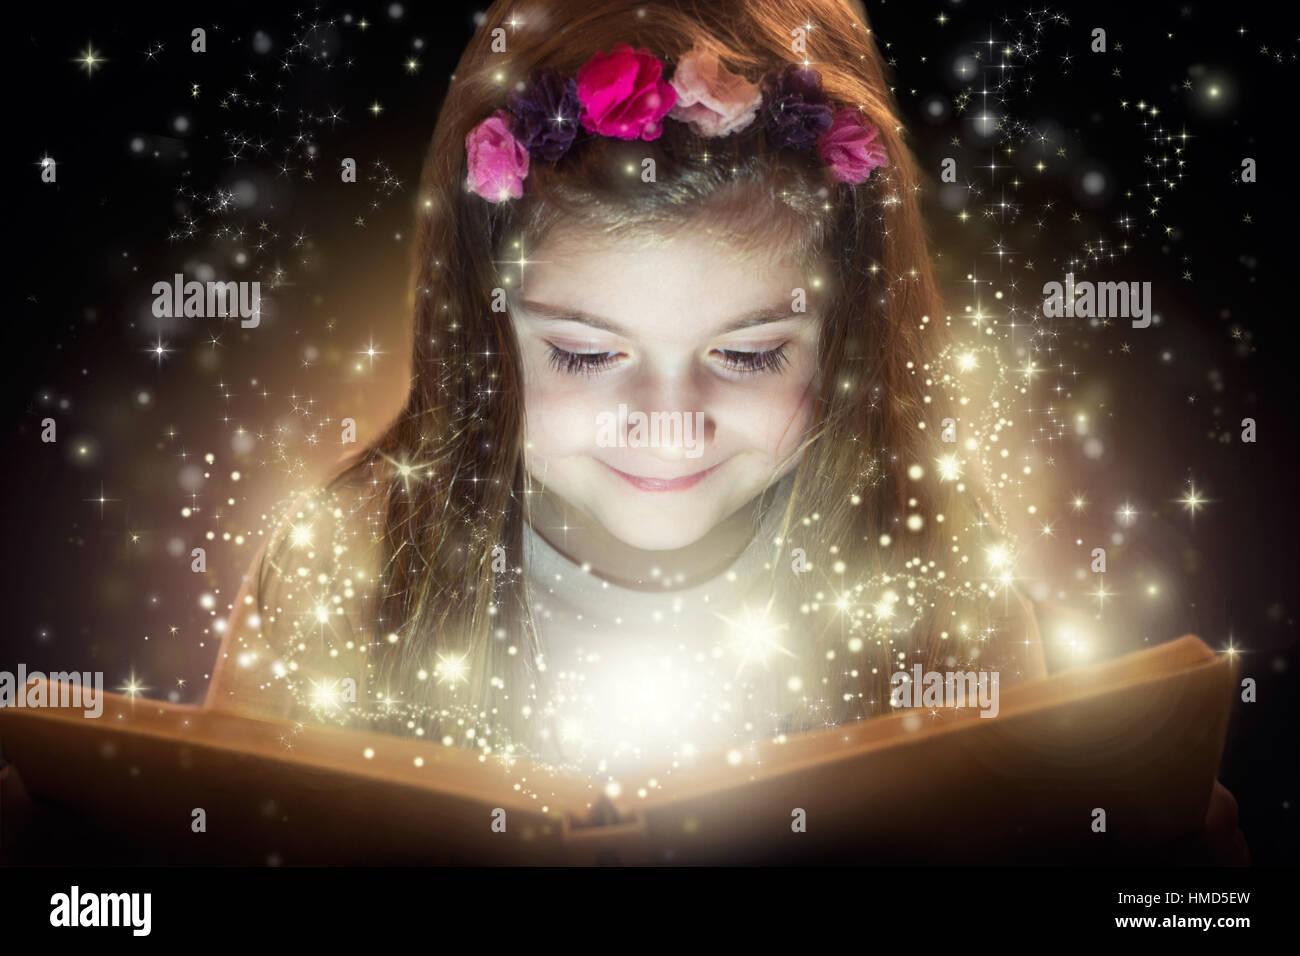 Niña leyendo libro mágico, concepto de fantasía Foto de stock